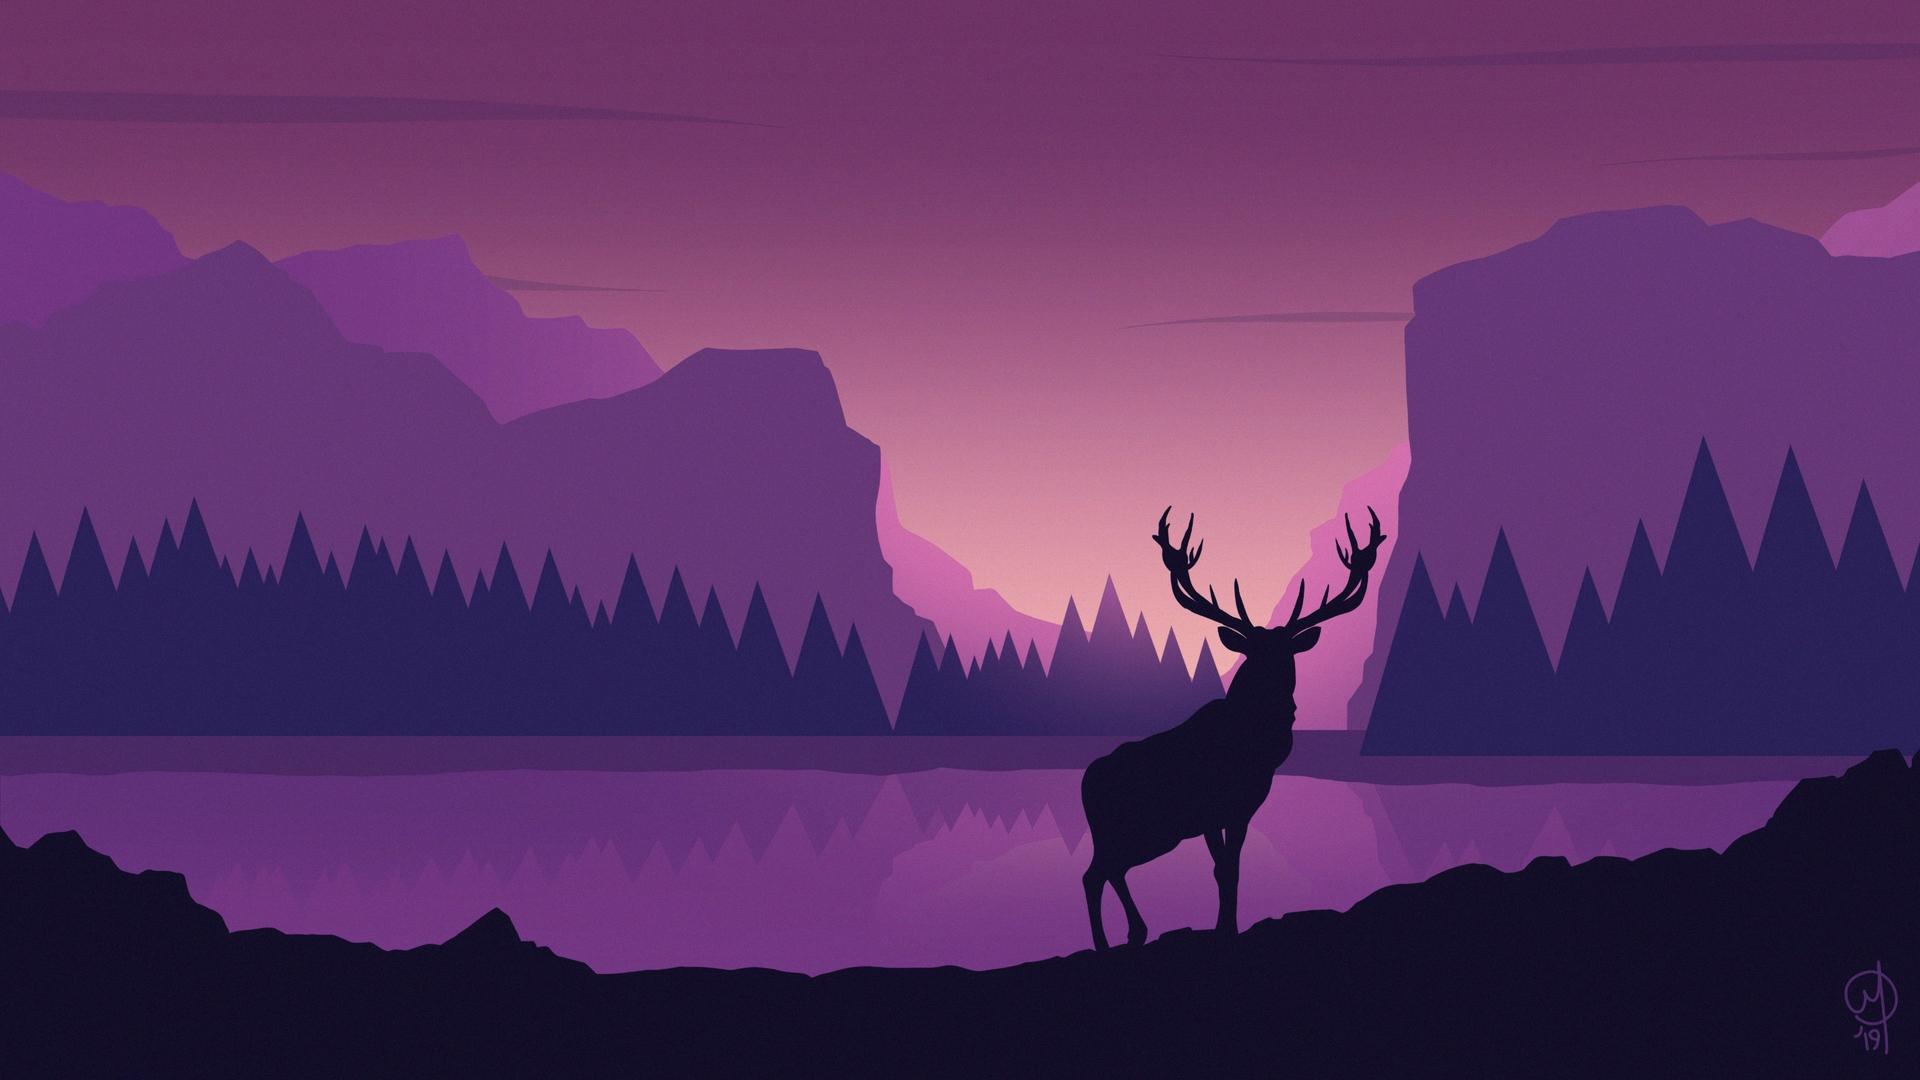 Download wallpaper 1920x1080 deer art vector mountains 1920x1080